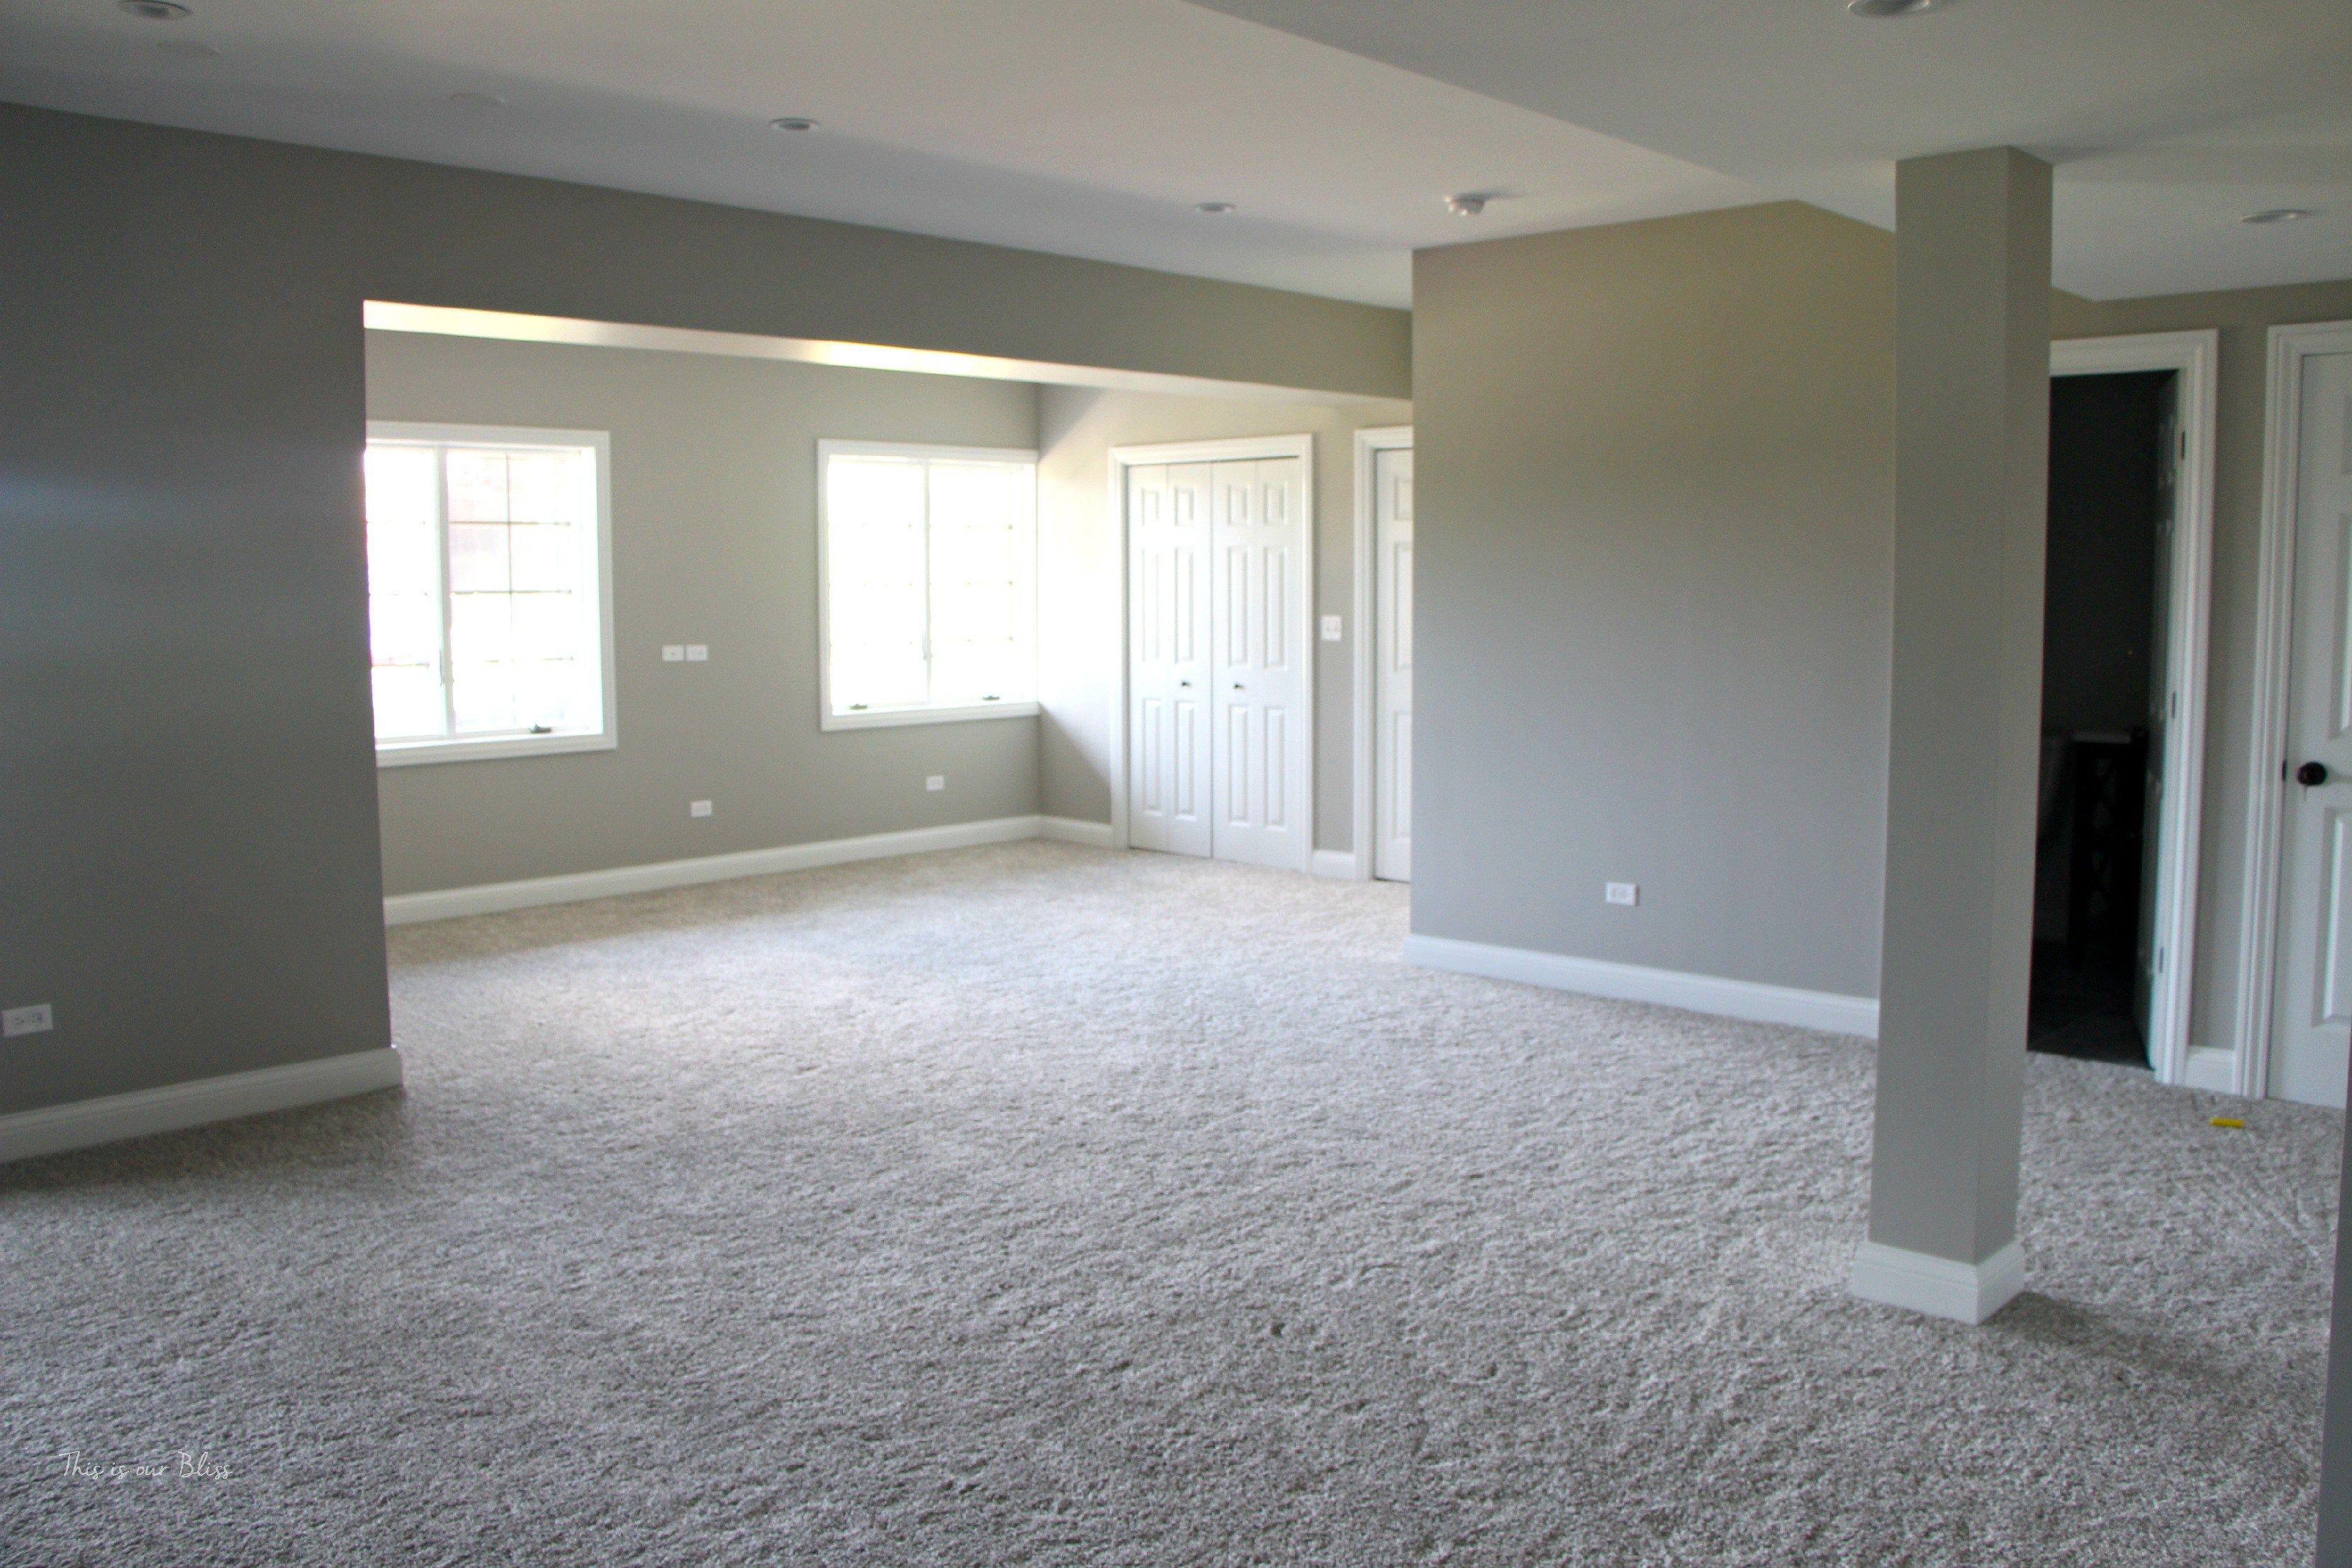 The Best Basement Paint Color And Carpet Choices House